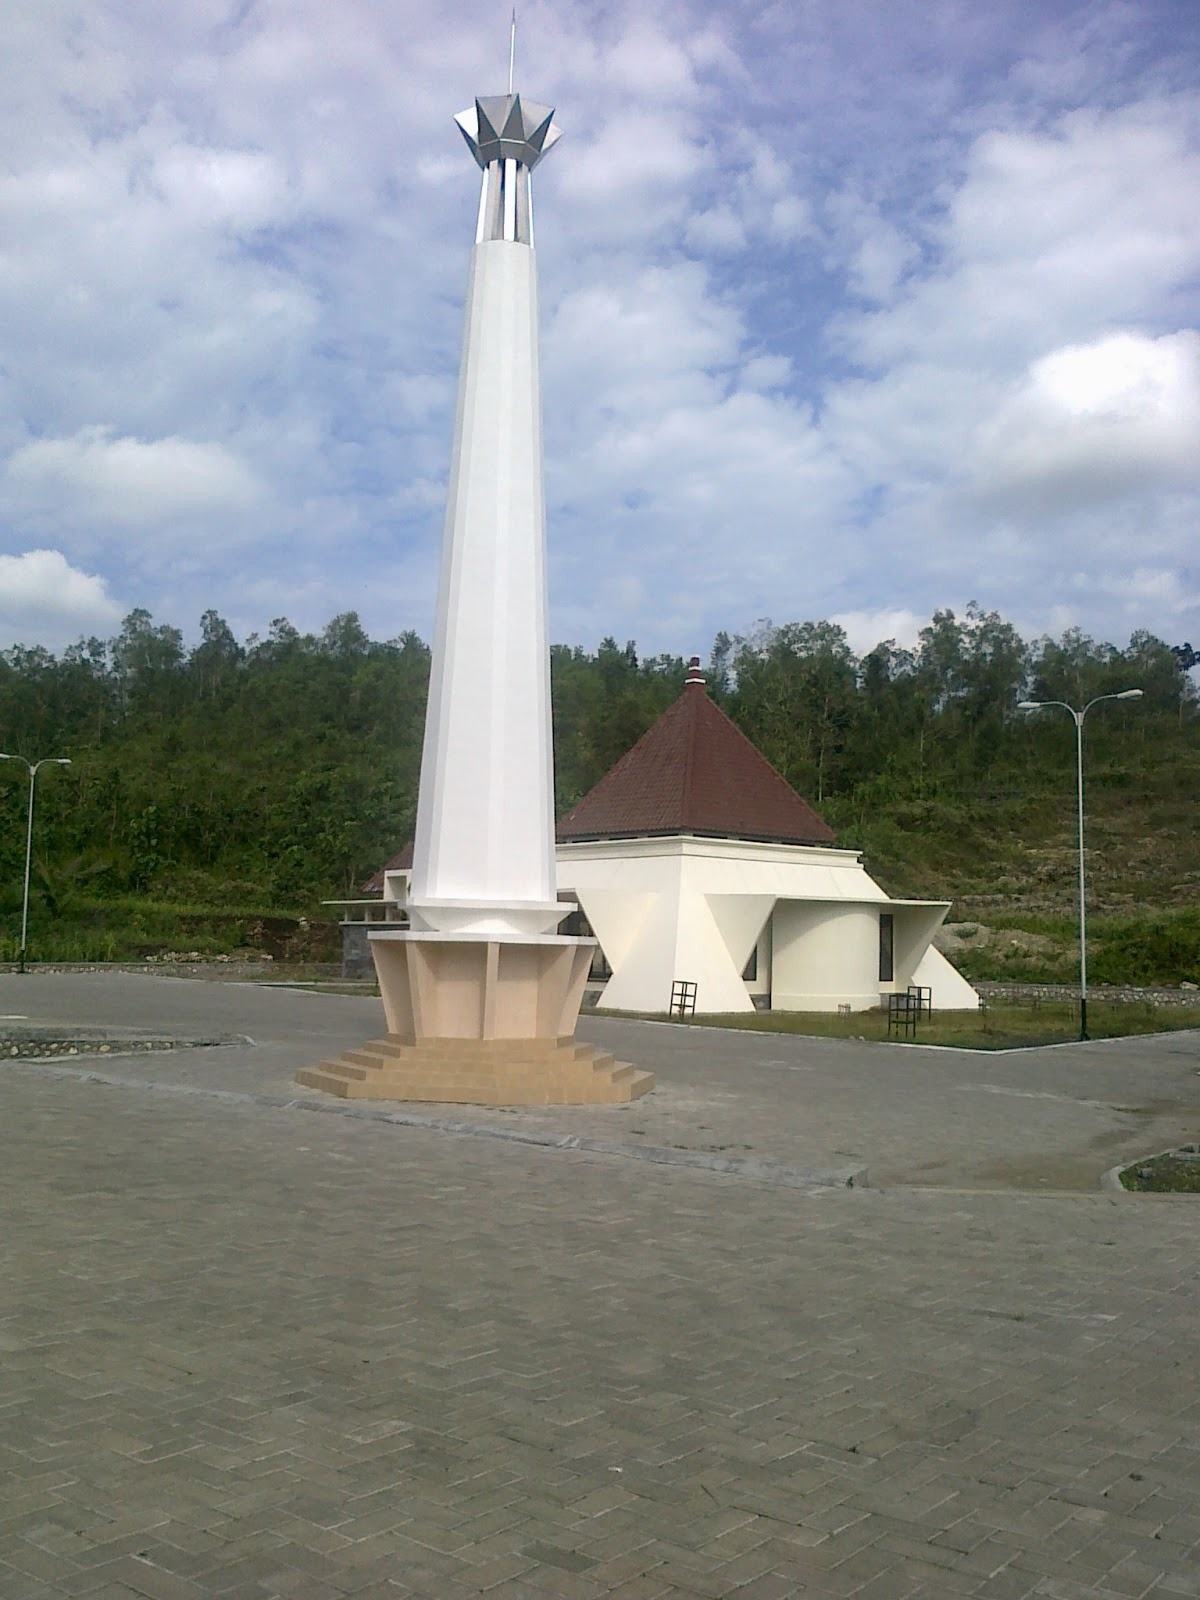 Biro Wisata Fortekindo Tour Museum Karst Dunia Wonogiri Jateng Terletak